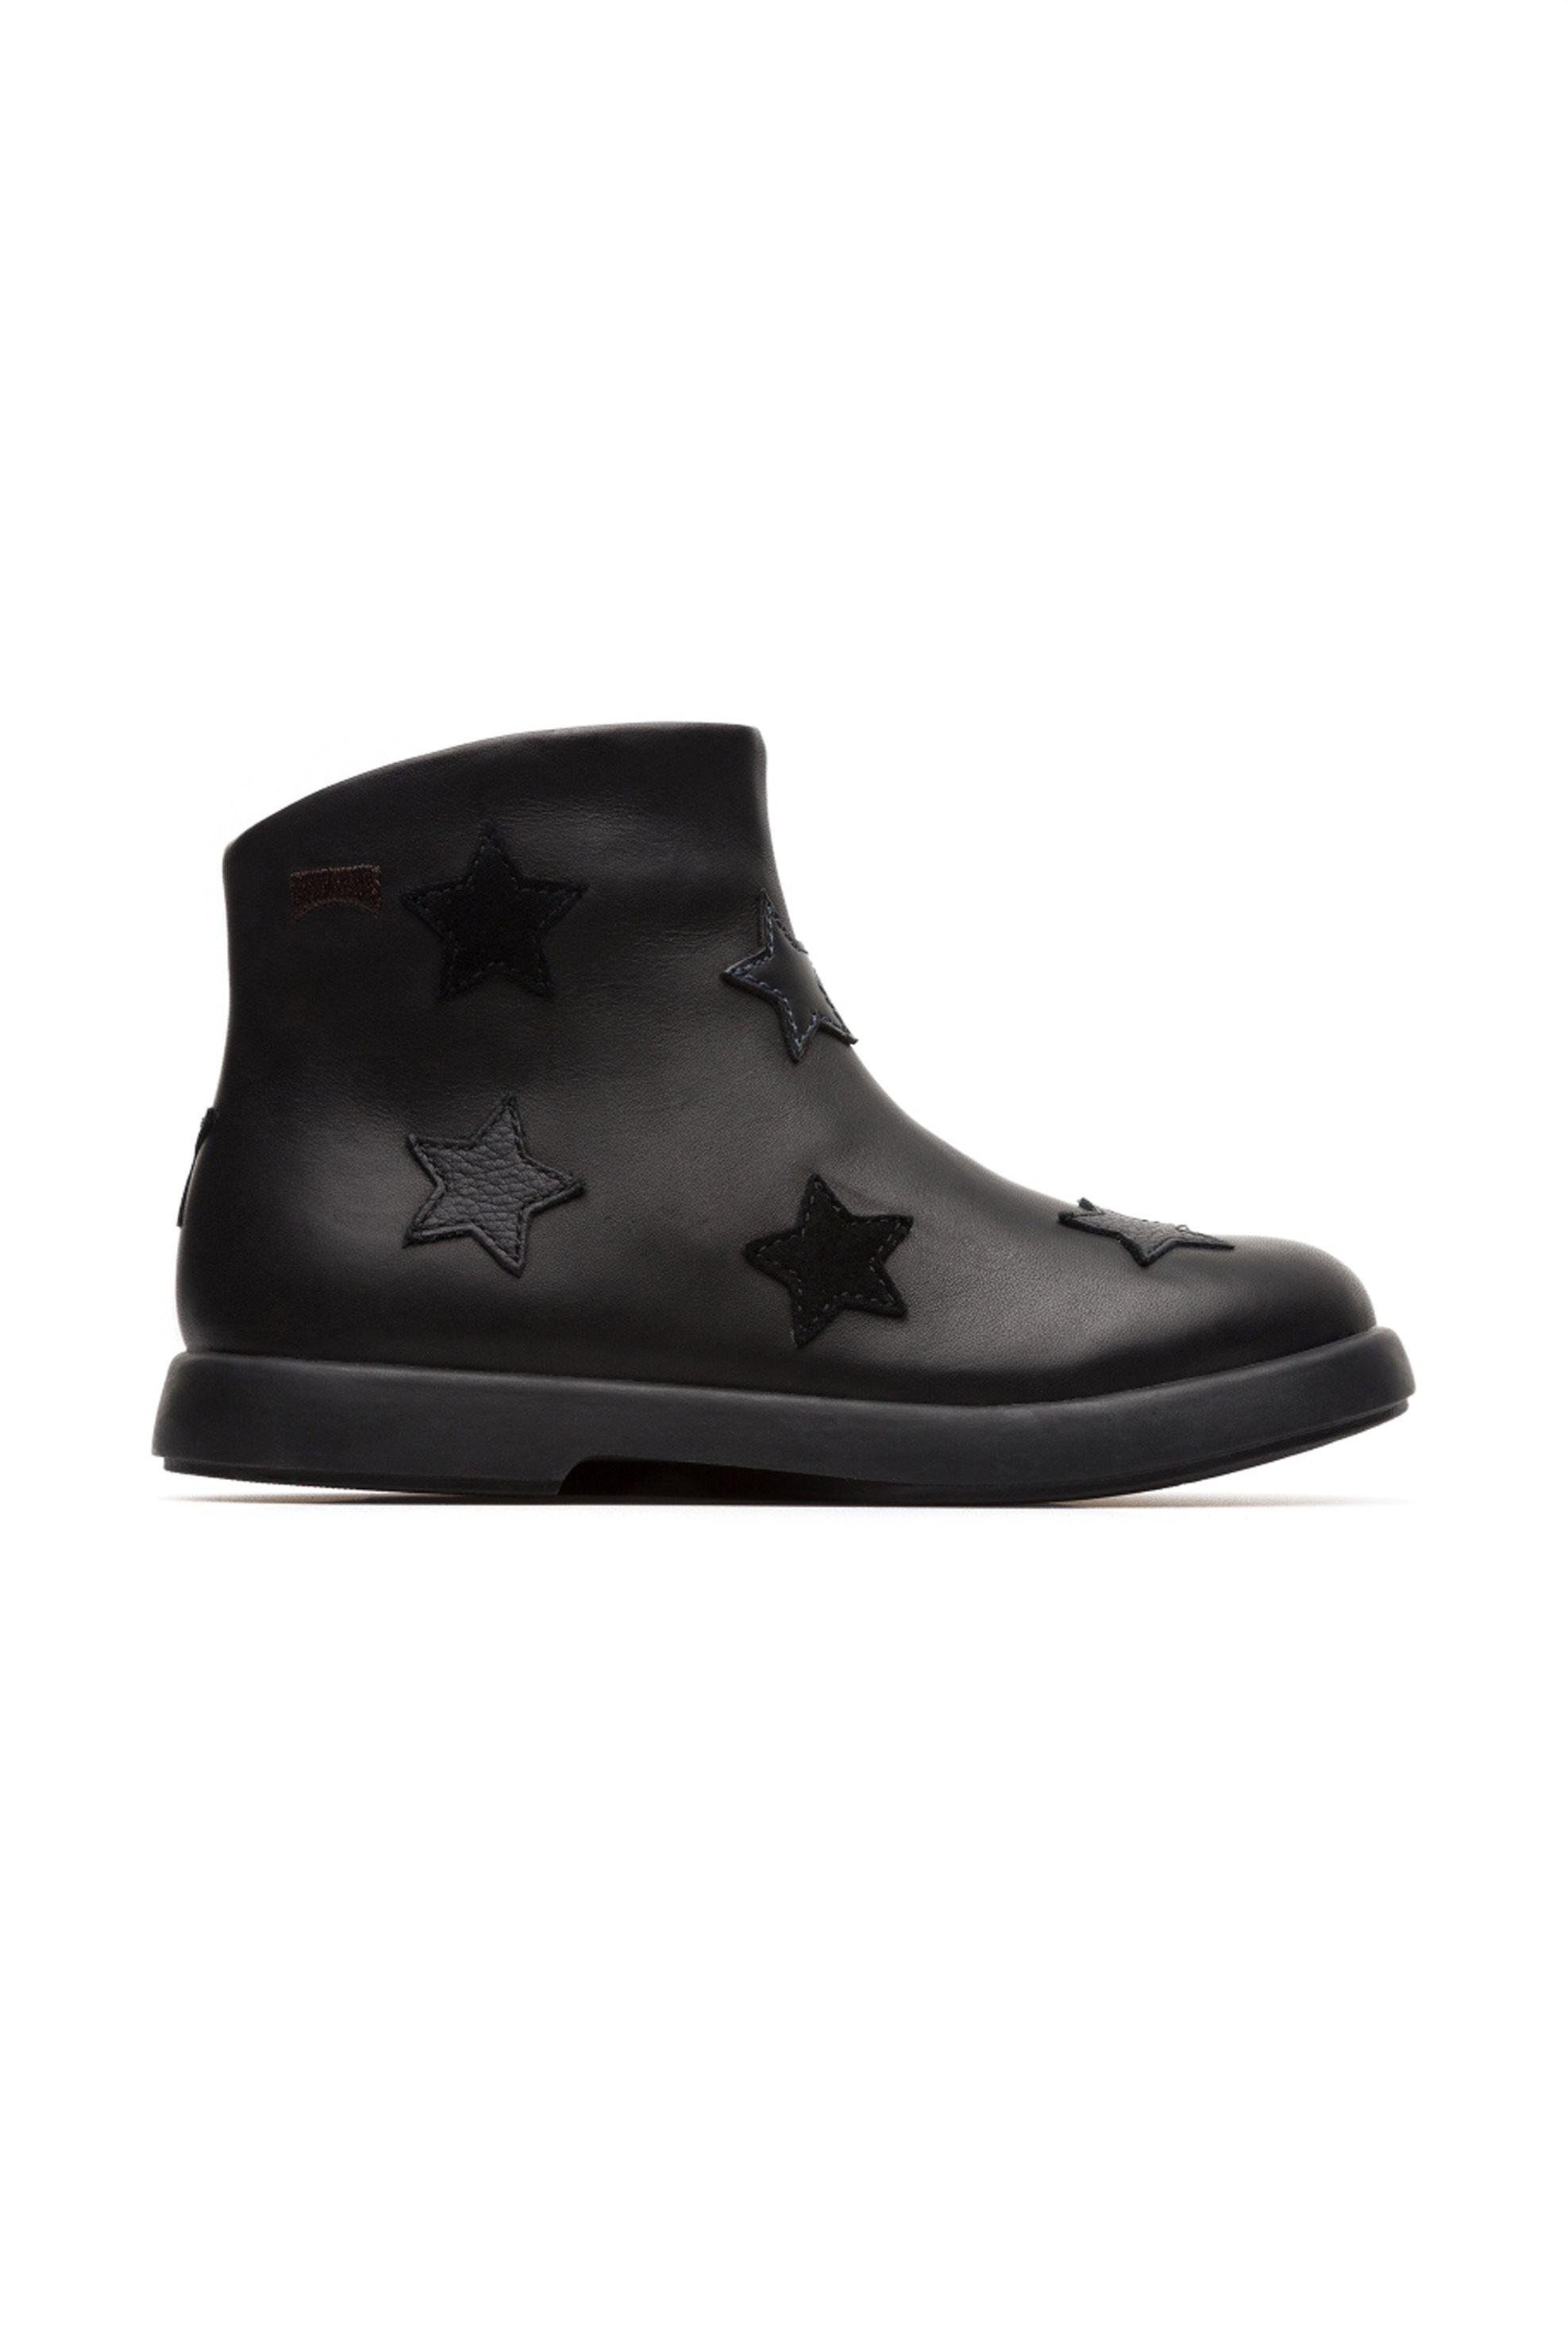 Camper βρεφικά μποτάκια μαύρα με απλικέ αστεράκια Twins - K900162-001-1 -  Μαύρο 92a4a9f9e0d